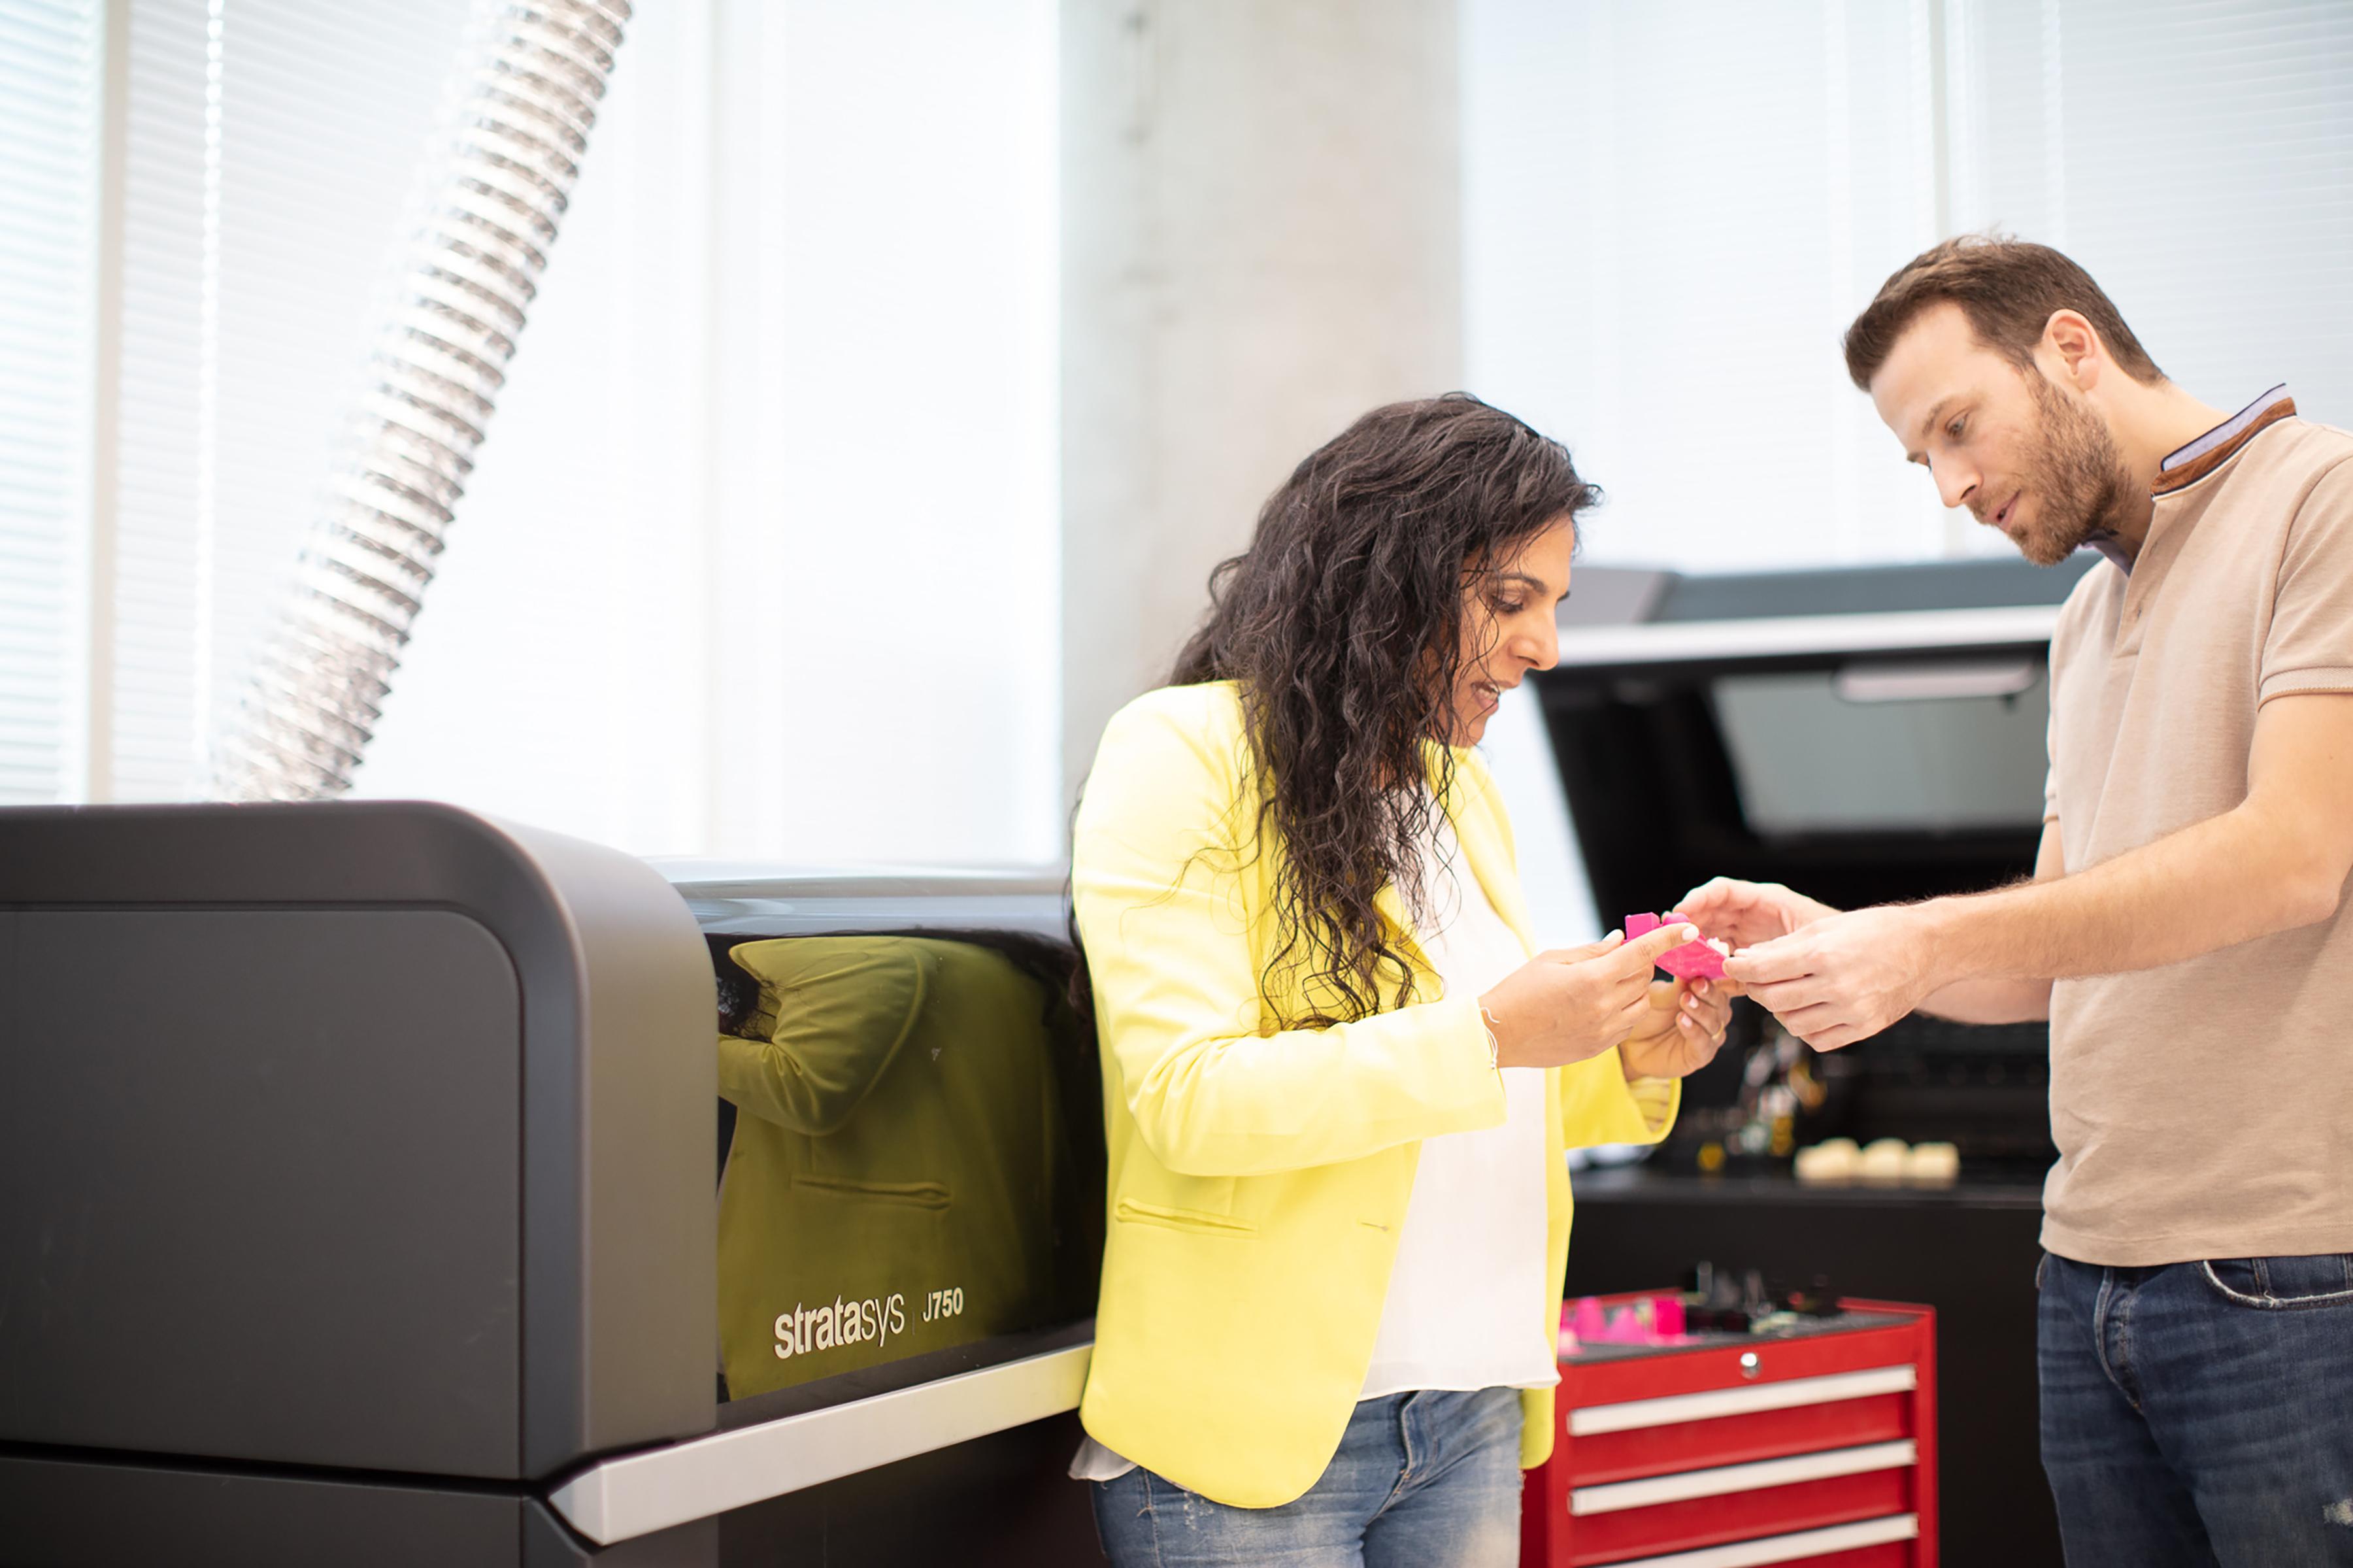 Stratasys launches the J750™ Digital Anatomy™ 3D Printer